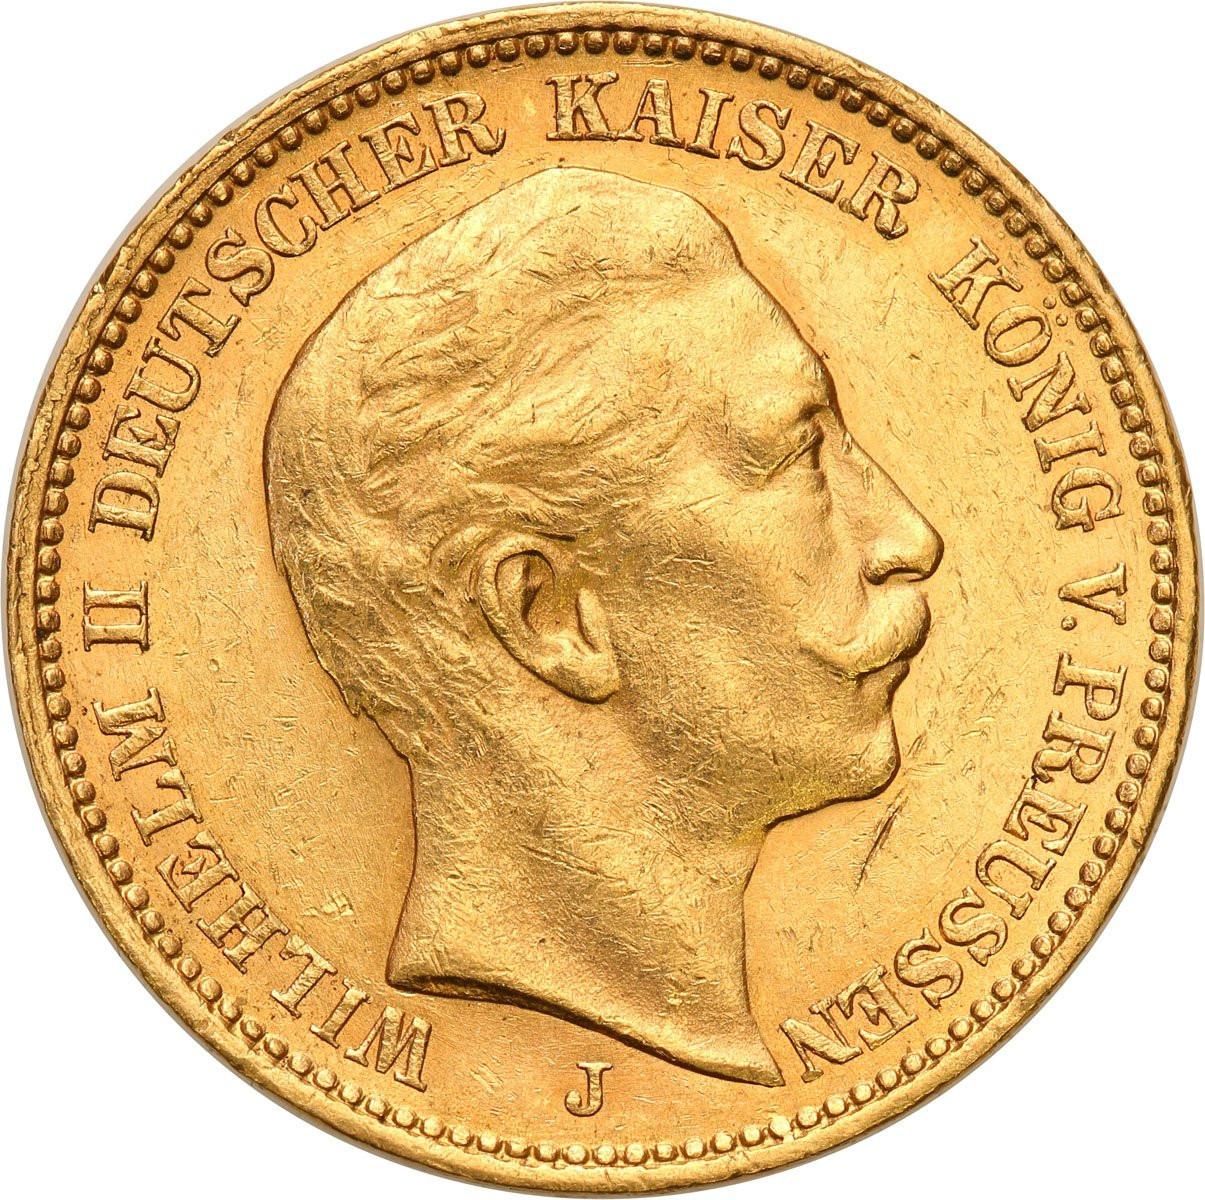 Niemcy, Prusy. Wilhelm II. 20 Marek 1910 J, Hamburg